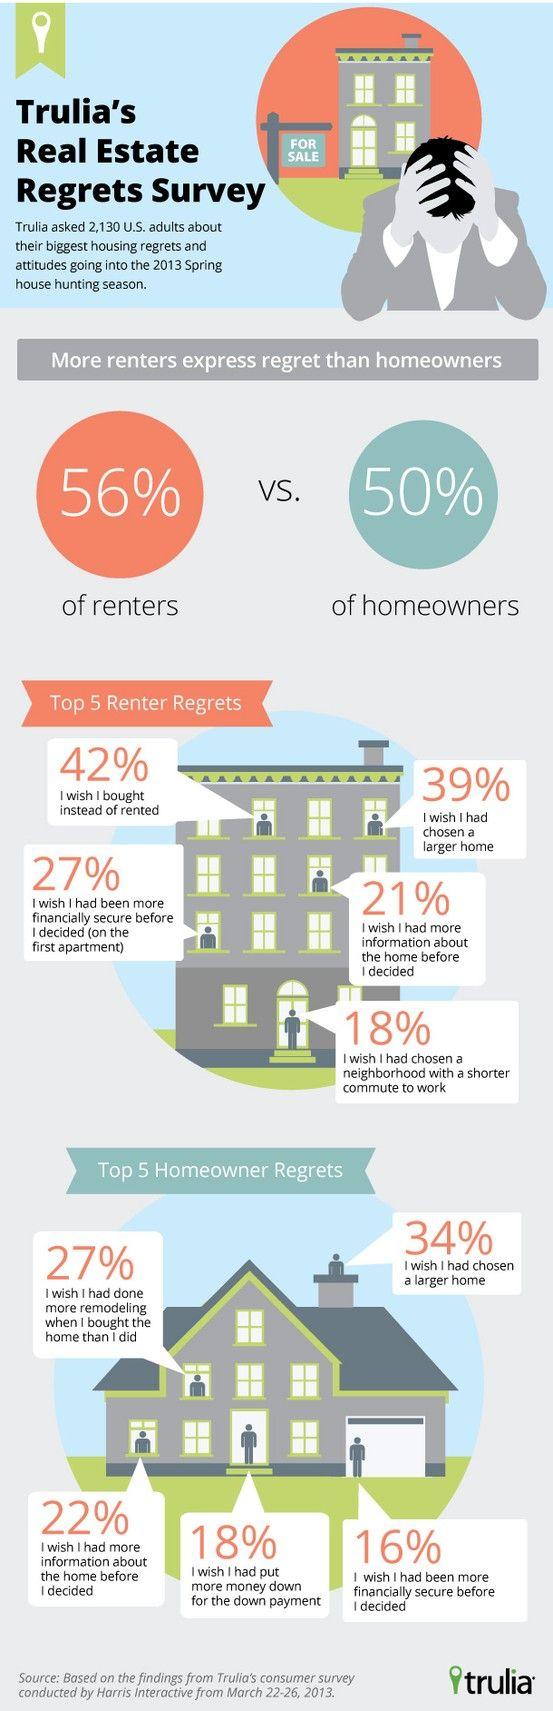 Trulias-Real-Estate-Regrets-Survey.jpg